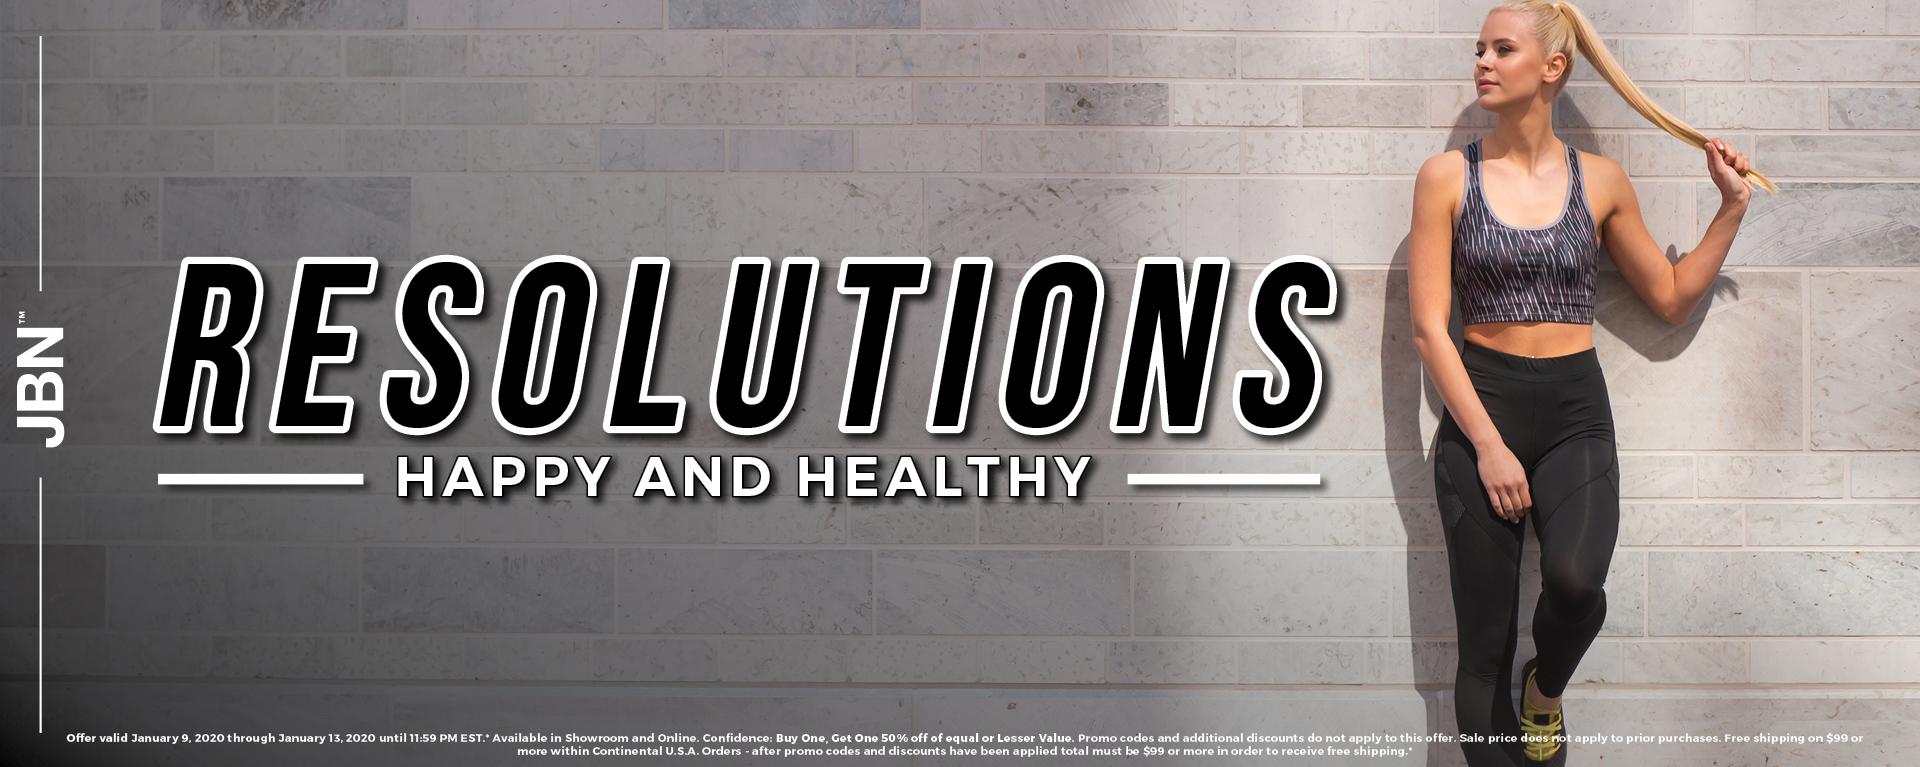 0120-resolutions-2.jpg